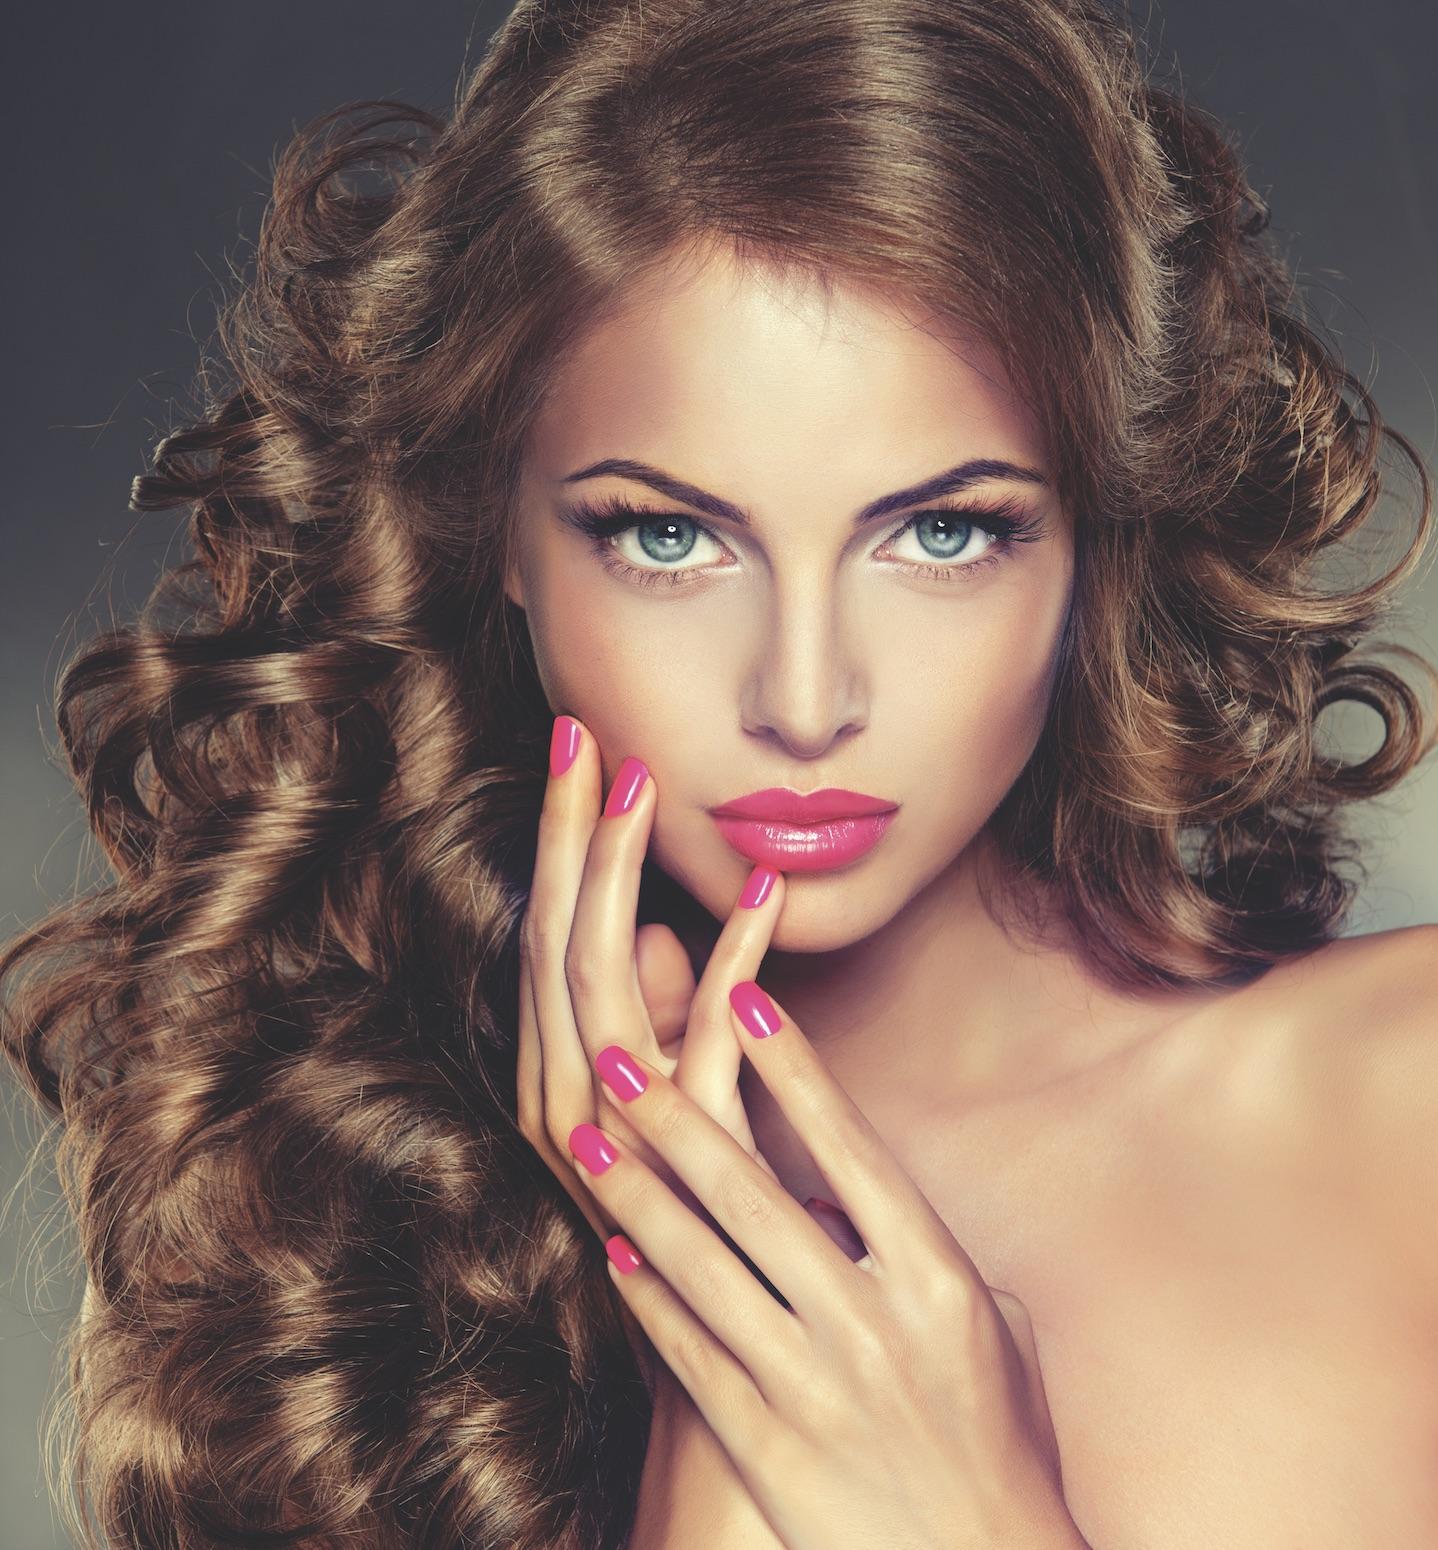 SEPHORA Let's Get Beauty Together